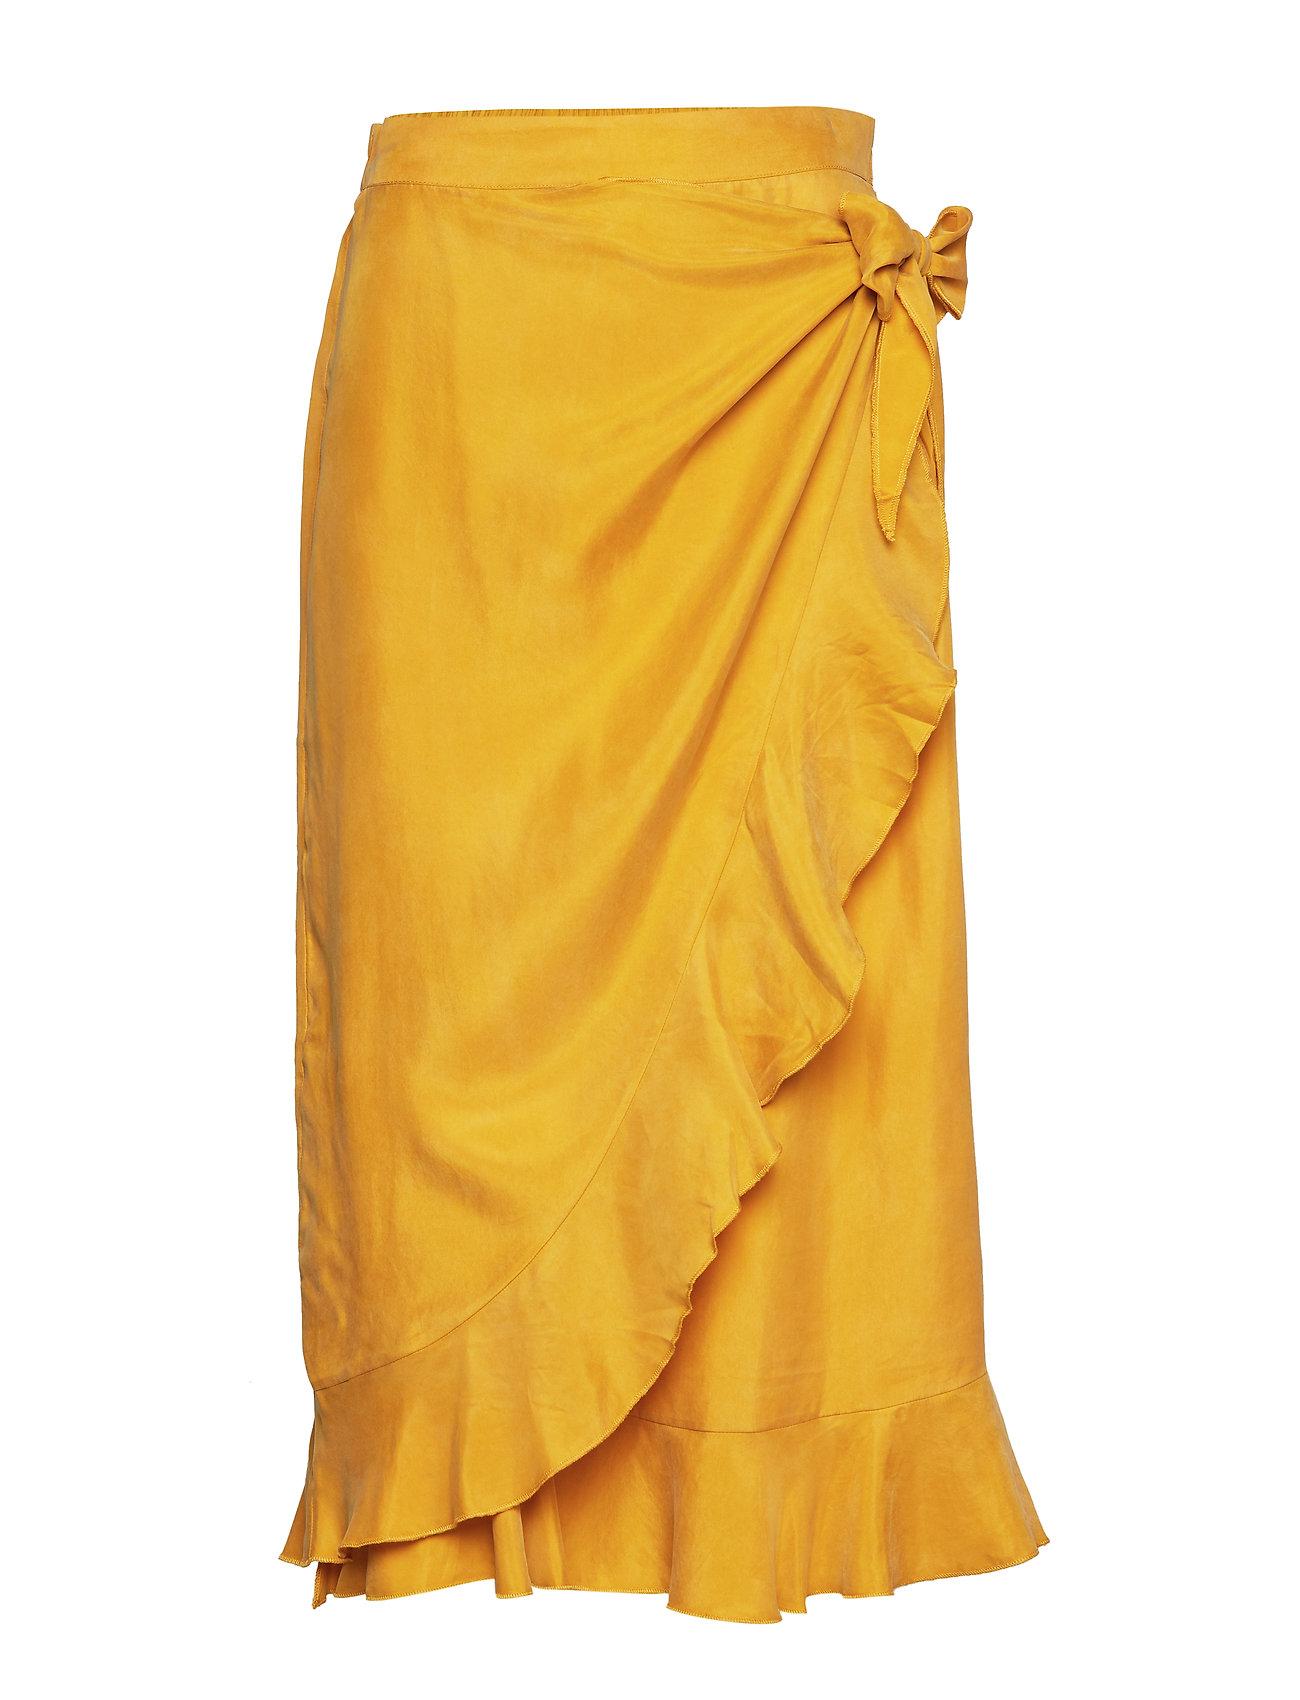 Coster Copenhagen Skirt w. ruffles and tieband detail - GOLD SPICE